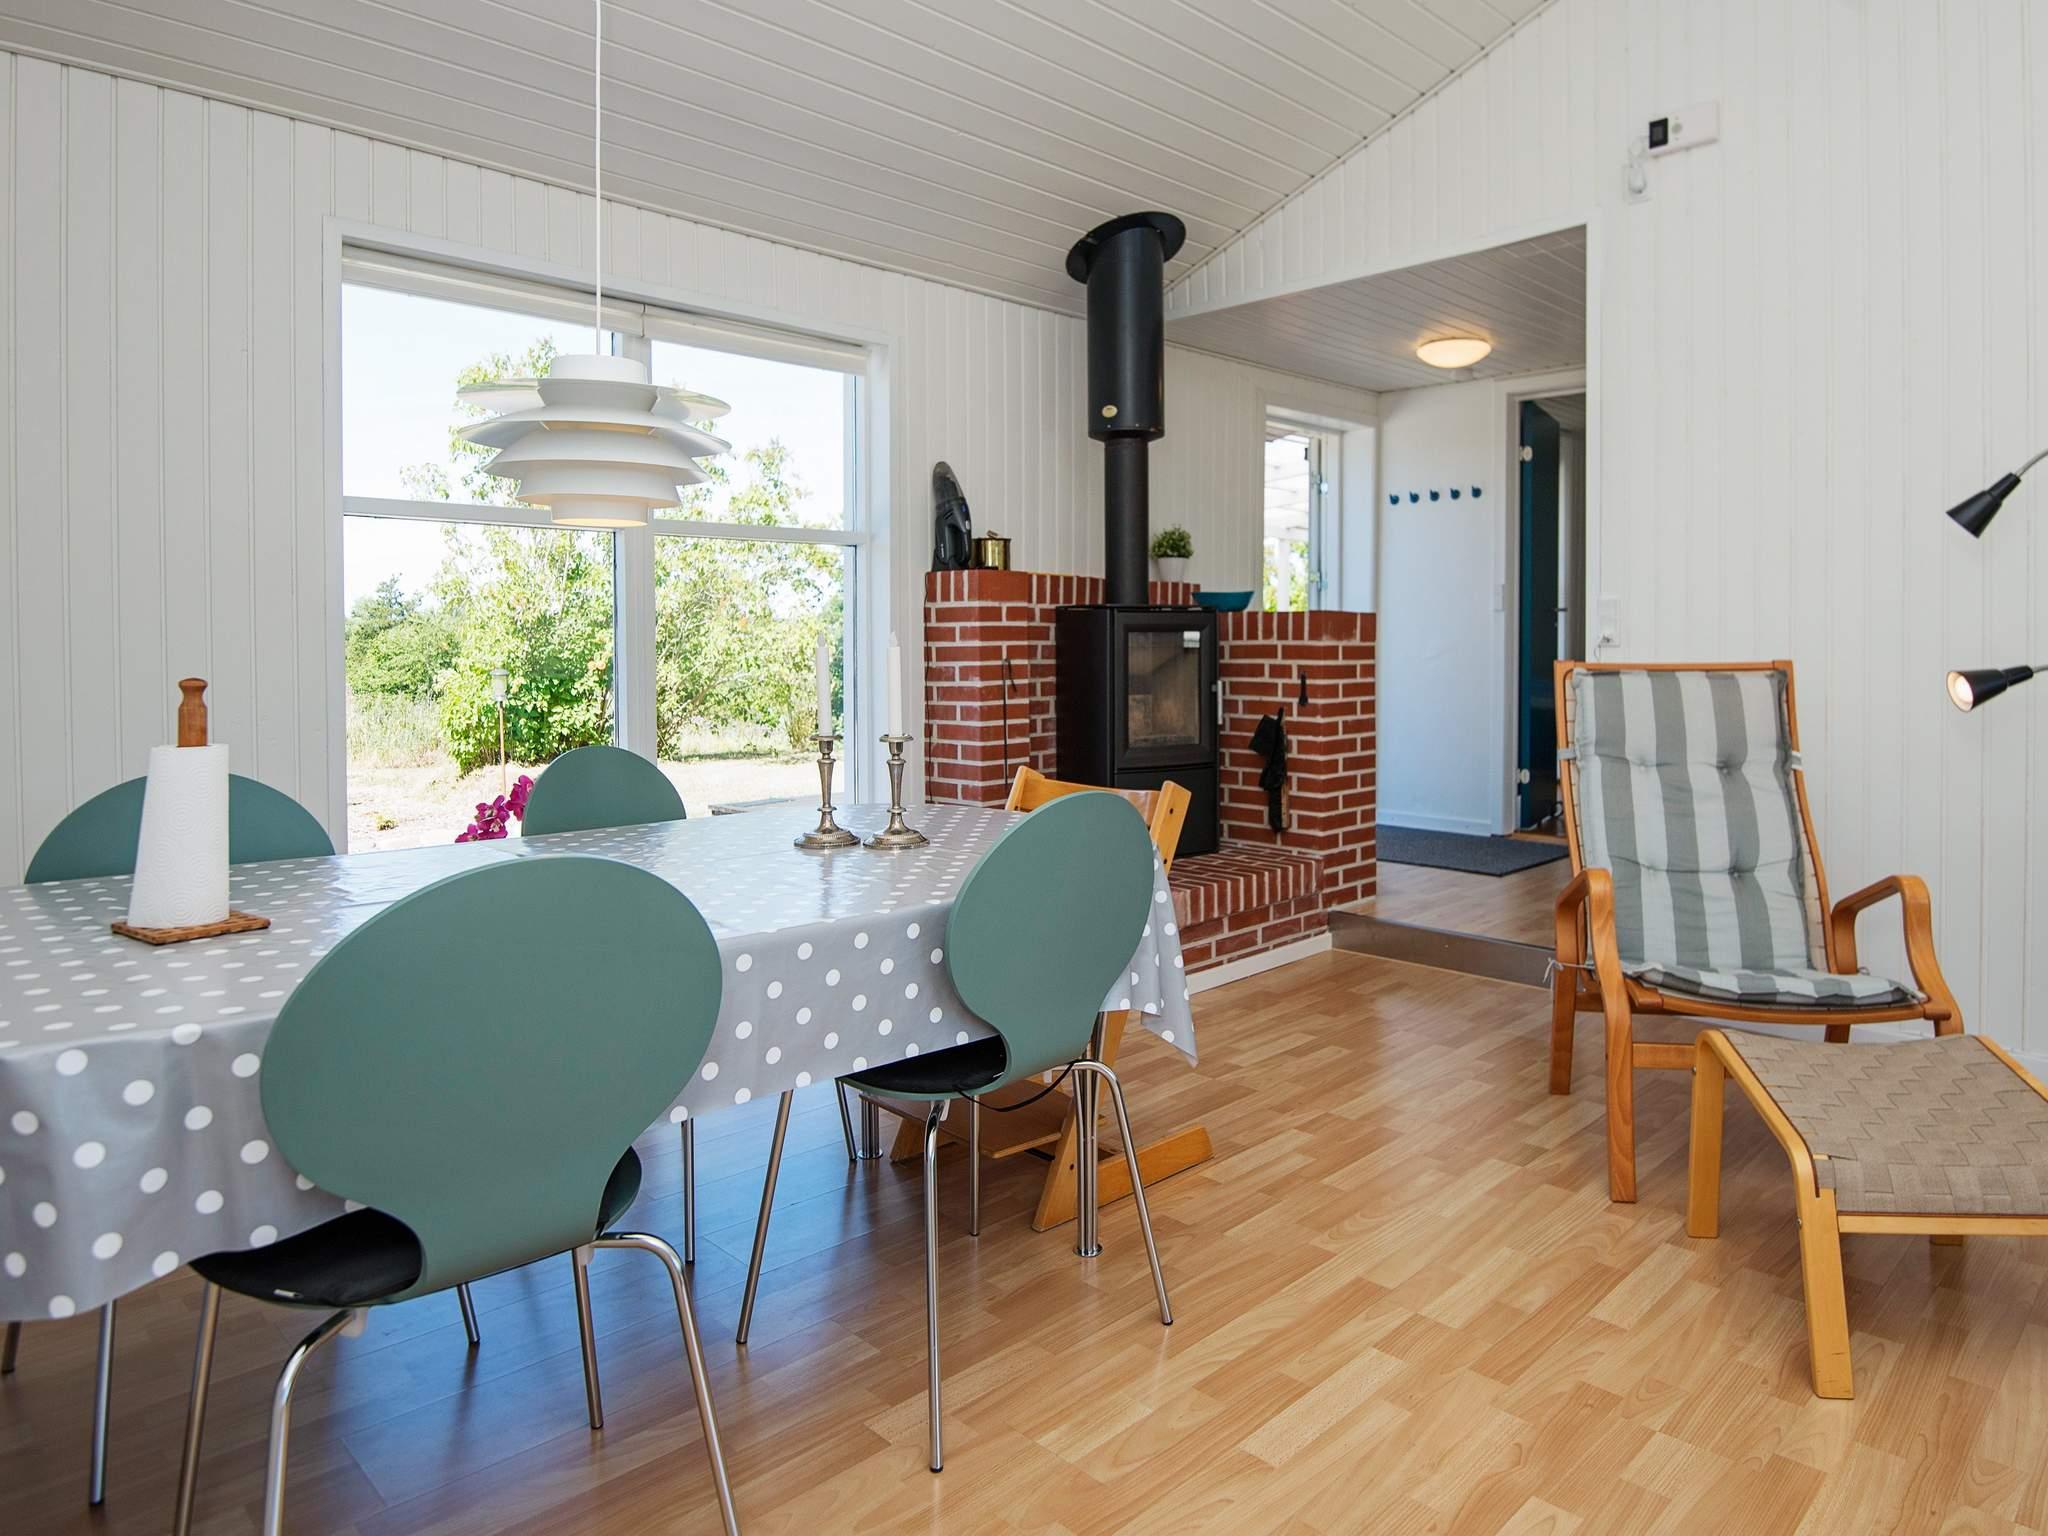 Maison de vacances Helgenæs (978615), Knebel, , Mer Baltique danoise, Danemark, image 3